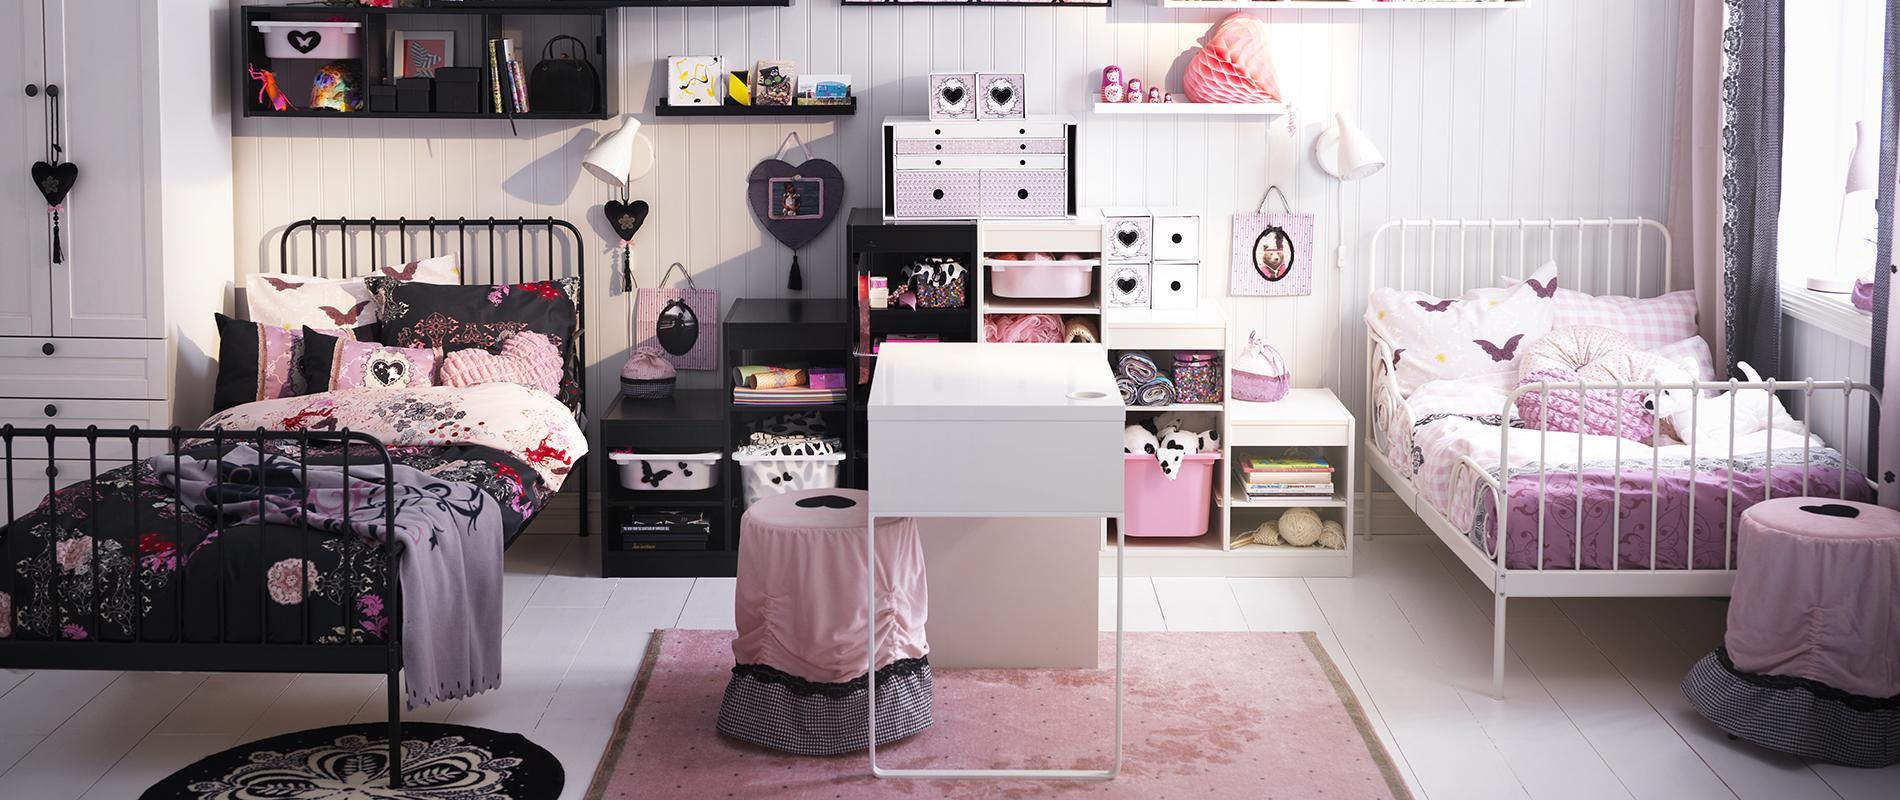 Une chambre pour deux mais chacun son espace madame figaro - Ikea cree sa chambre ...